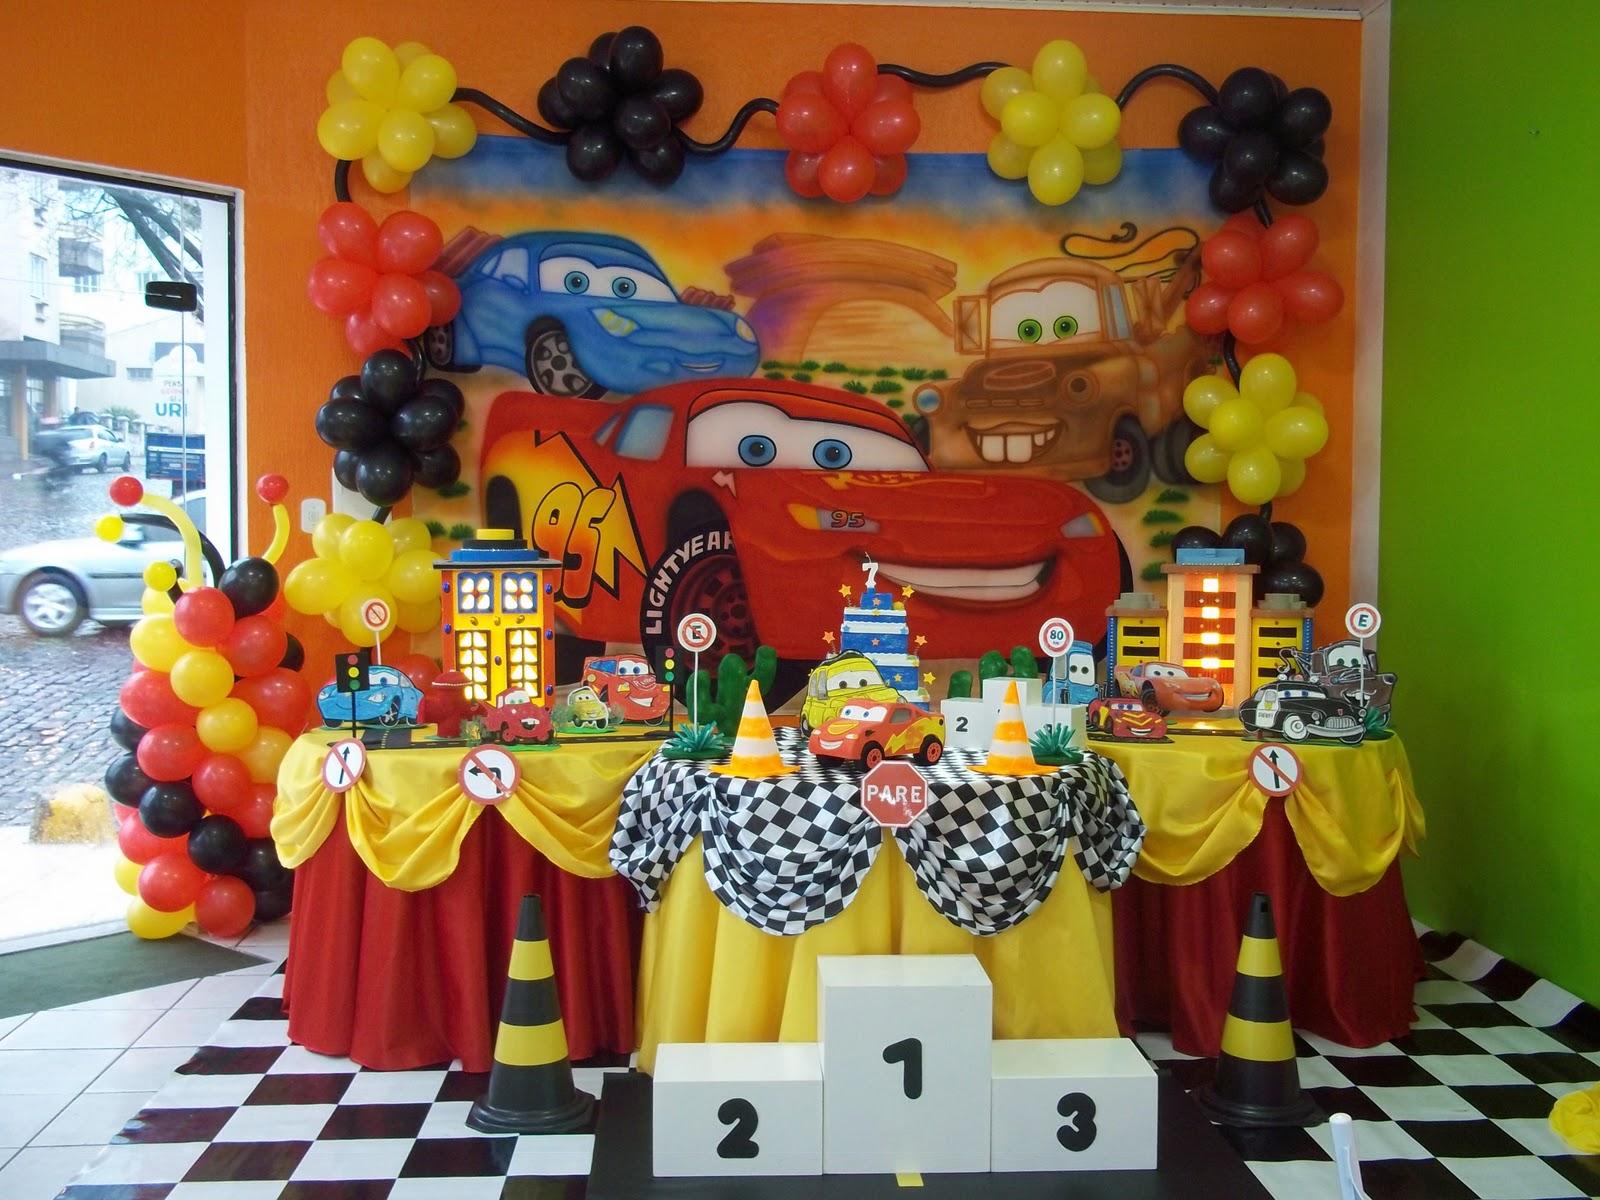 Decora o de festa infantil tema carros for Decoracion para aniversario